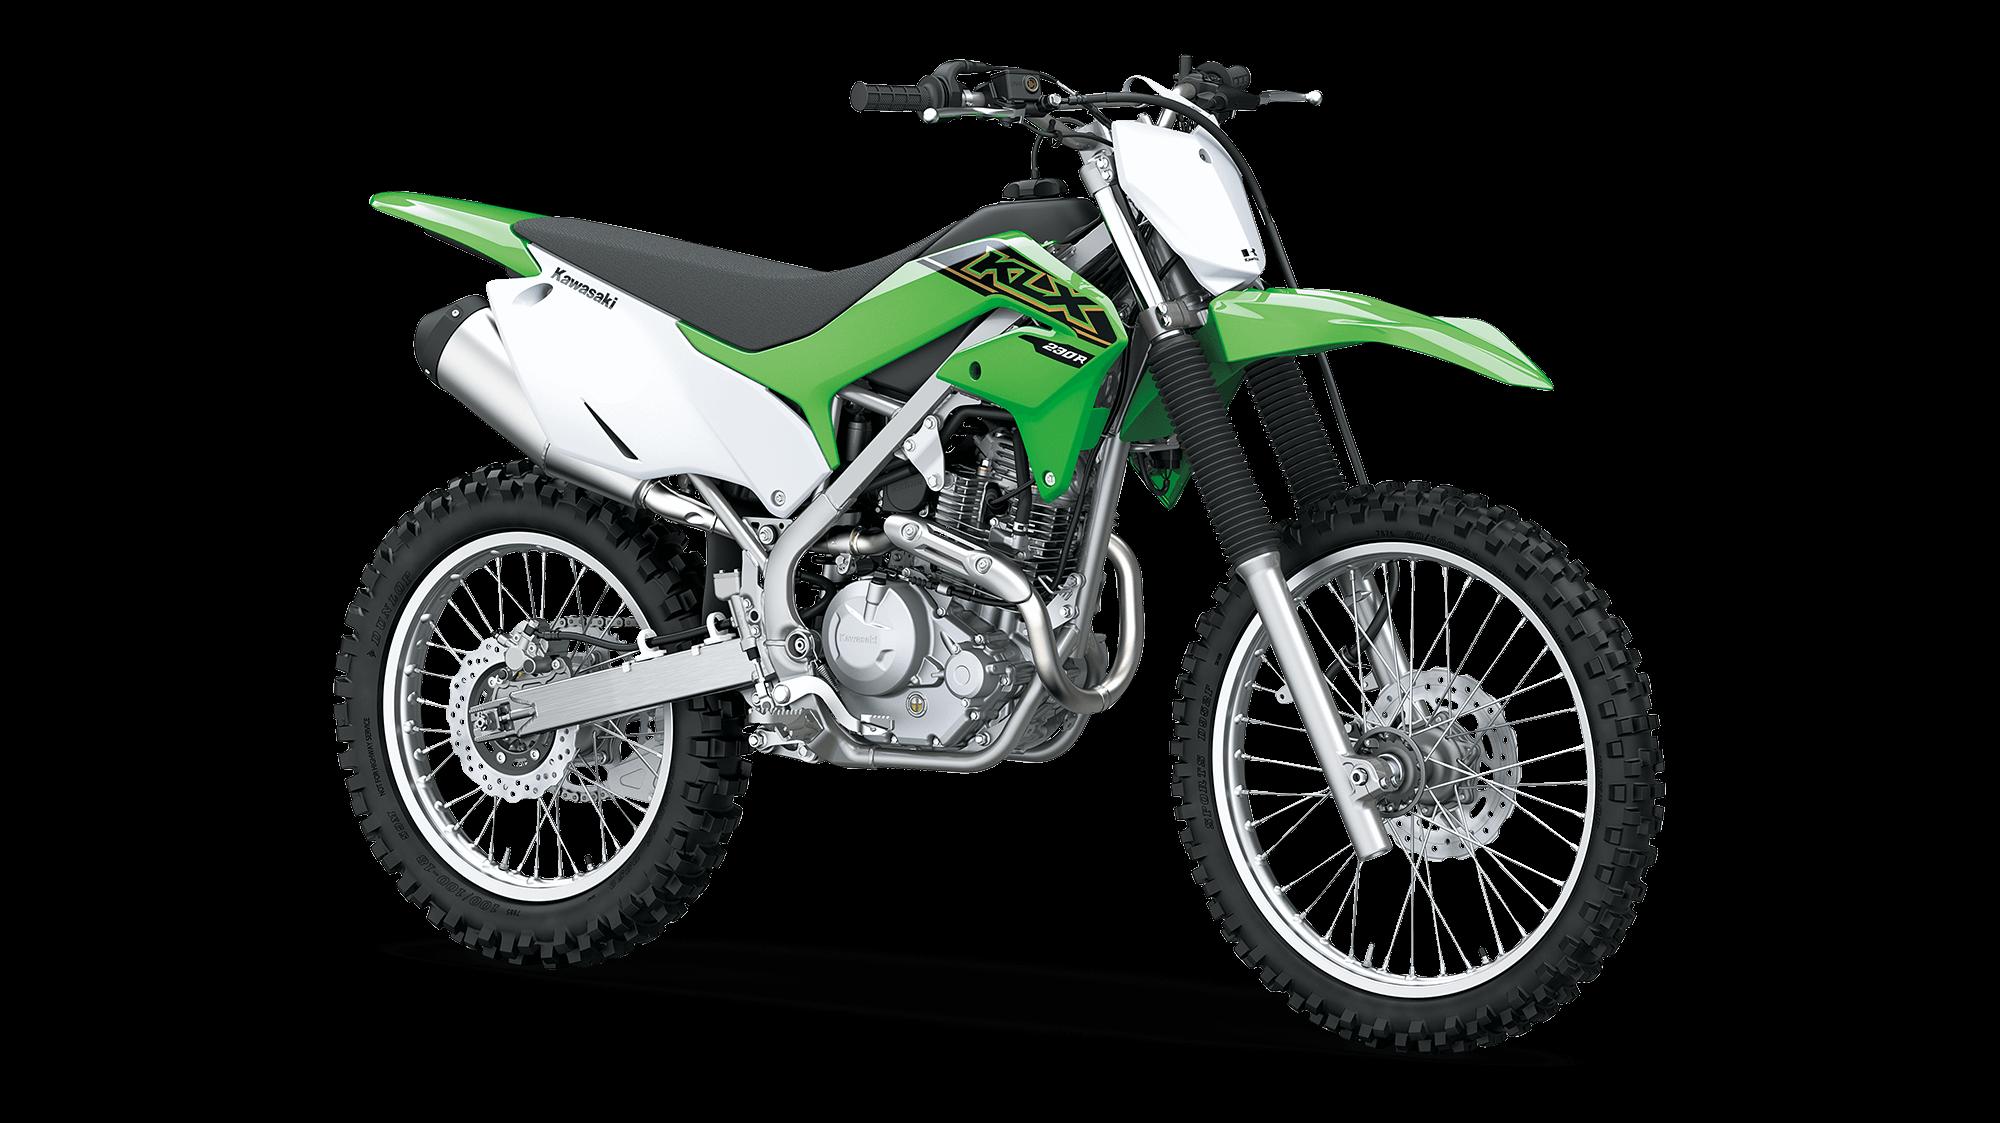 2021 KLX®230R KLR™/KLX® Motorcycle by Kawasaki